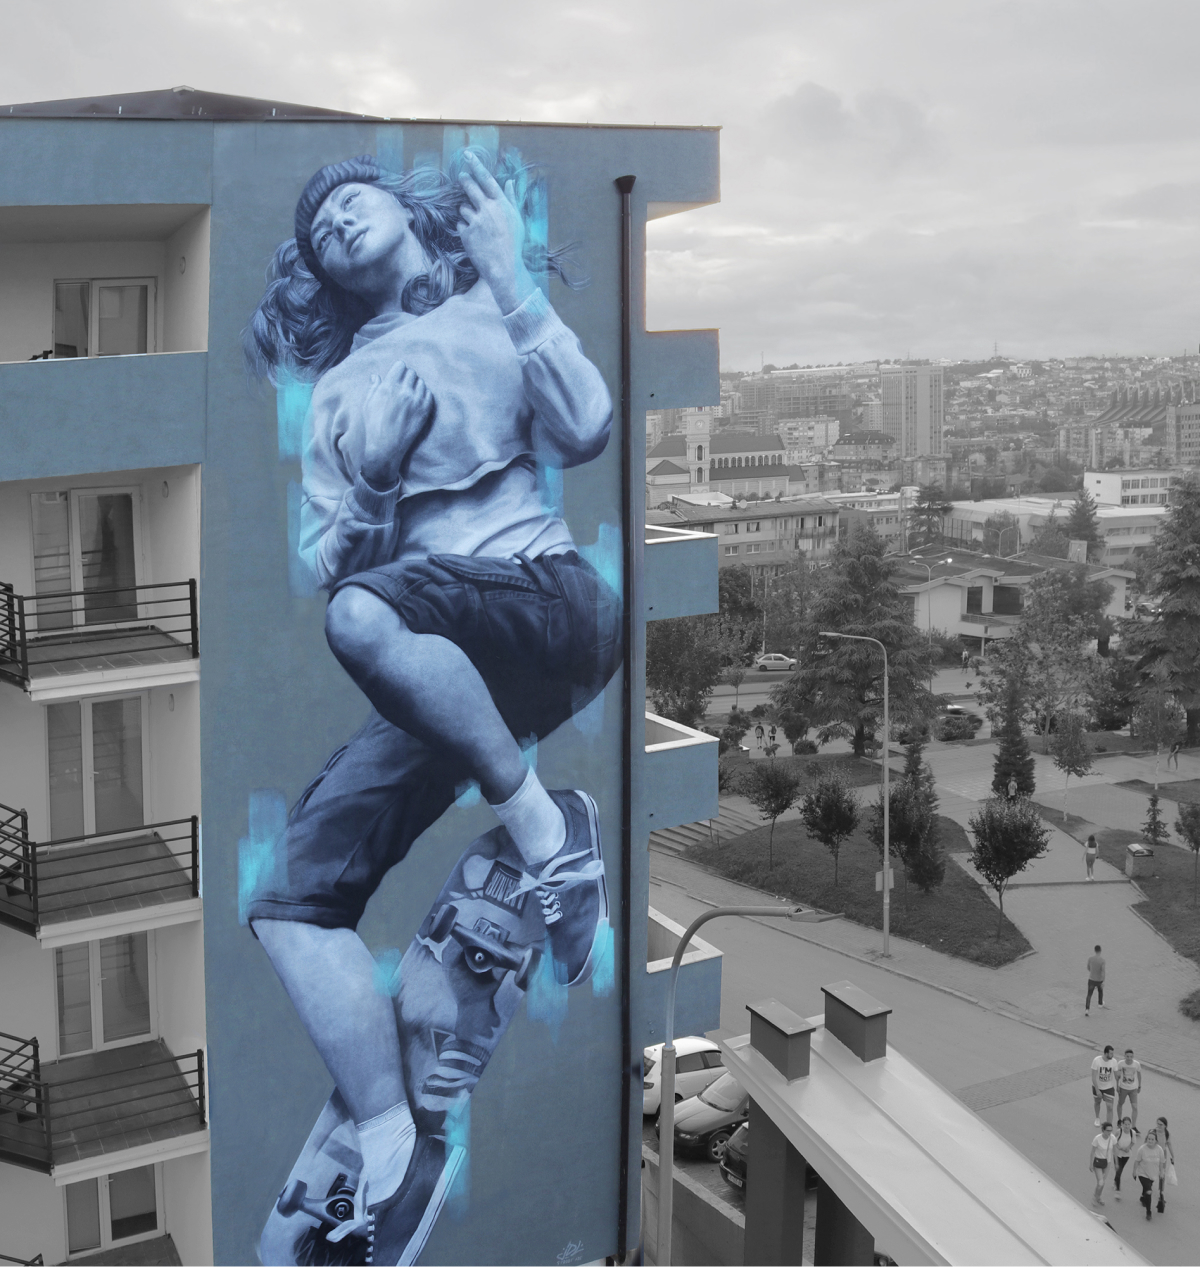 Mural Prihstina Kosovo, feminism, Female, Street art, Artist, Murals, Muralism